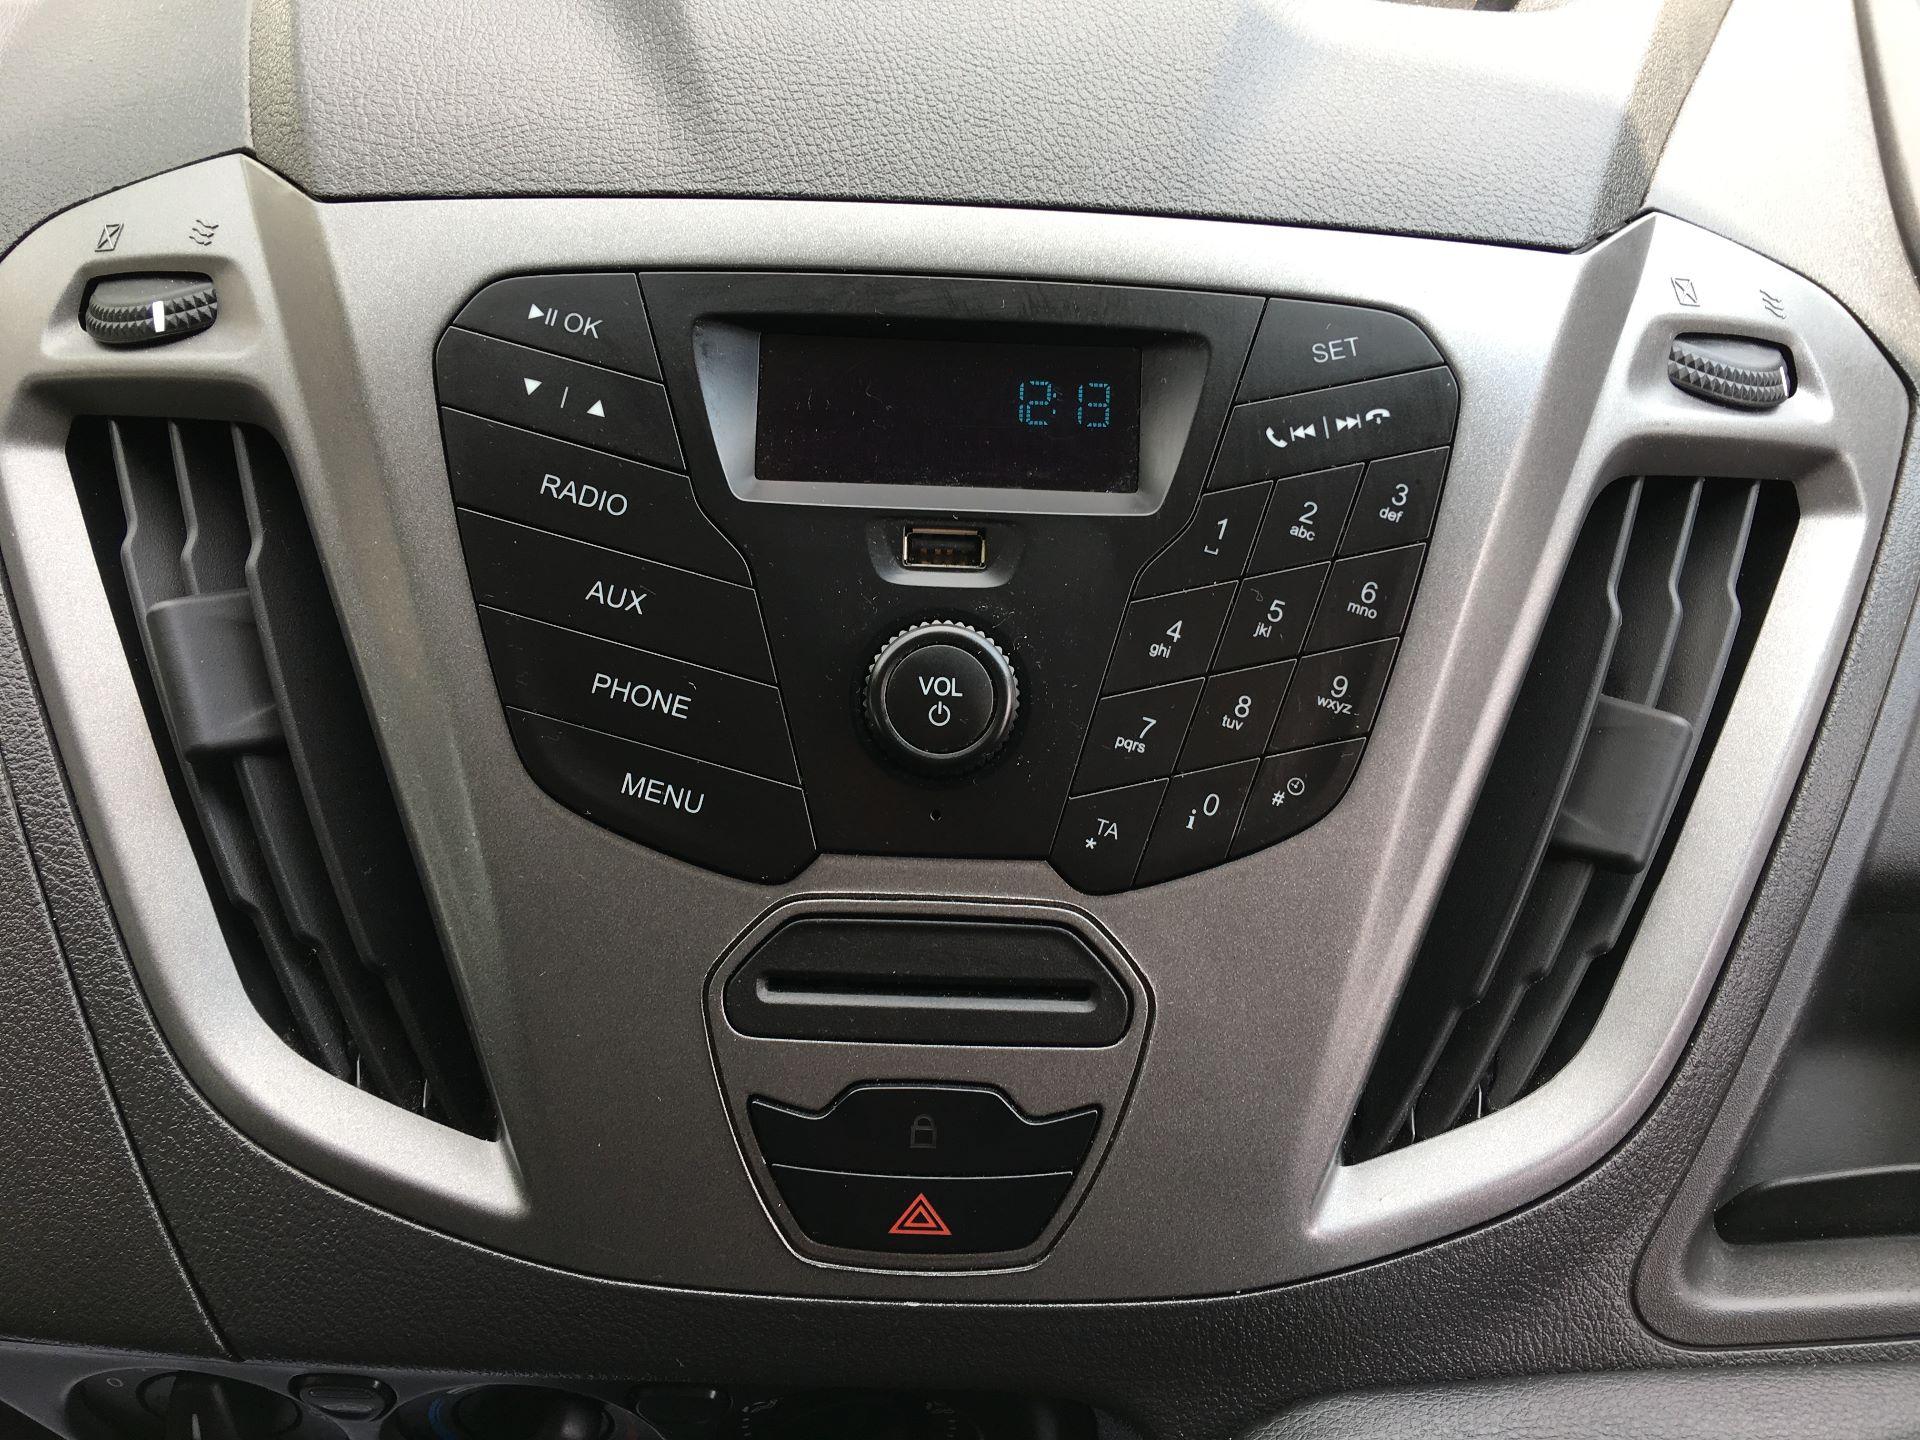 2018 Ford Transit Custom 270 L1 DIESEL FWD 2.0 TDCI 105PS LOW ROOF VAN EURO 6 (CP67NJY) Image 3